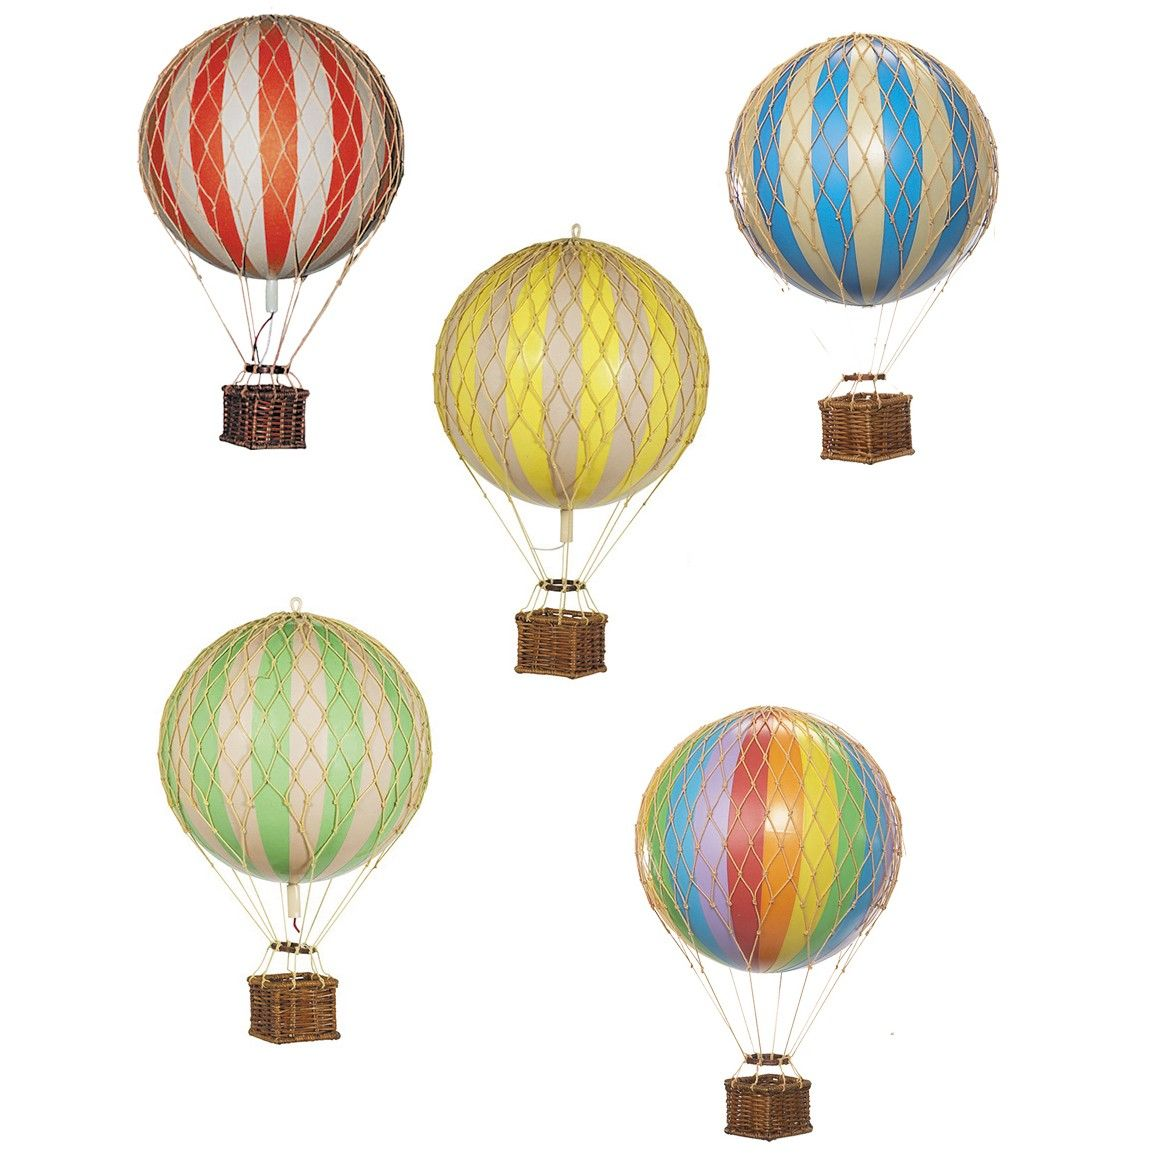 Authentic Models Small Hot Air Balloon Hot air balloon